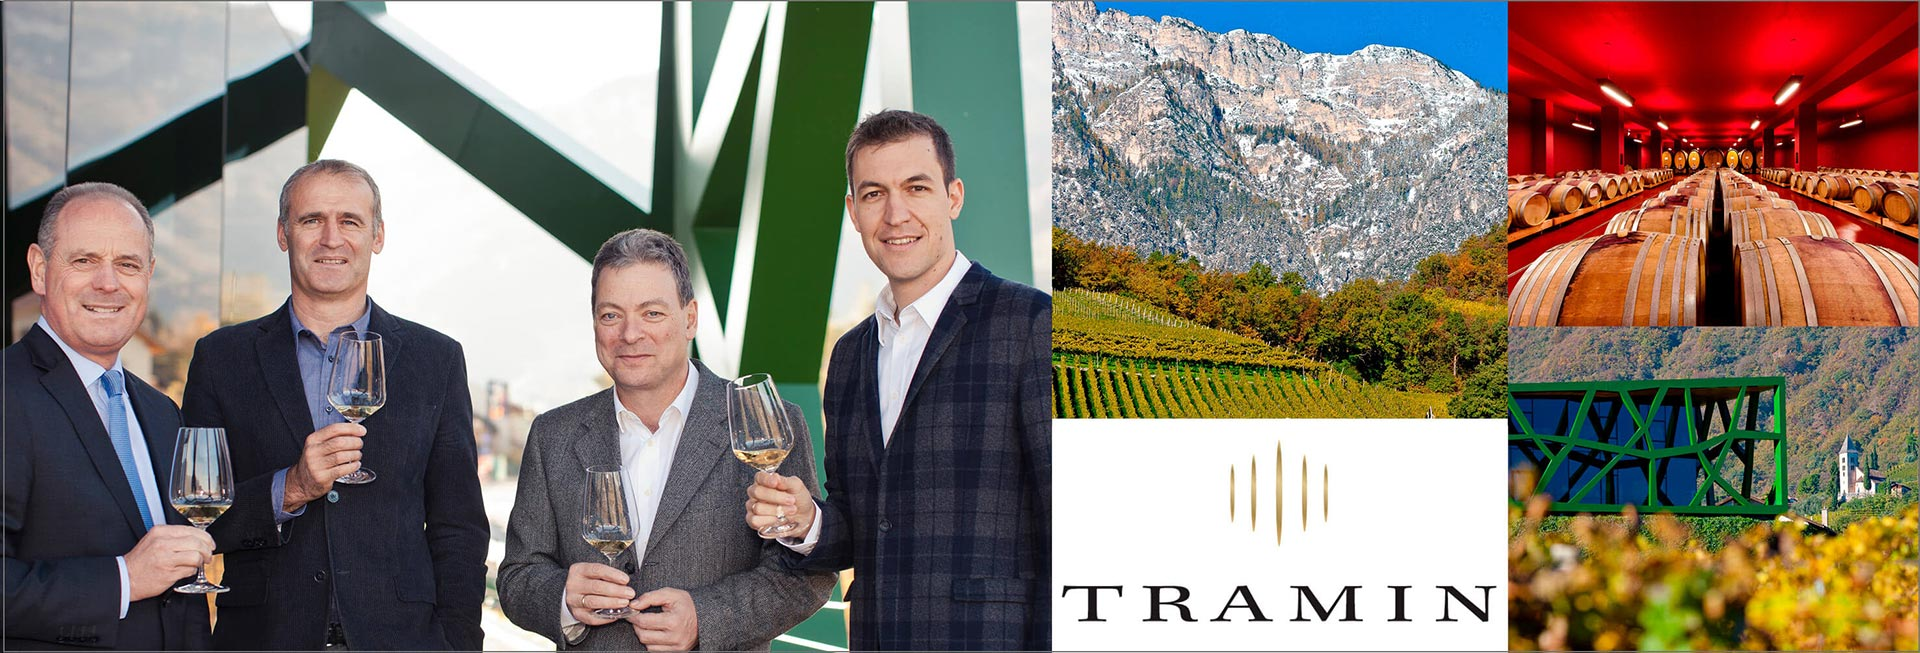 Cantina Tramin - Genossenschaft aus Südtirol